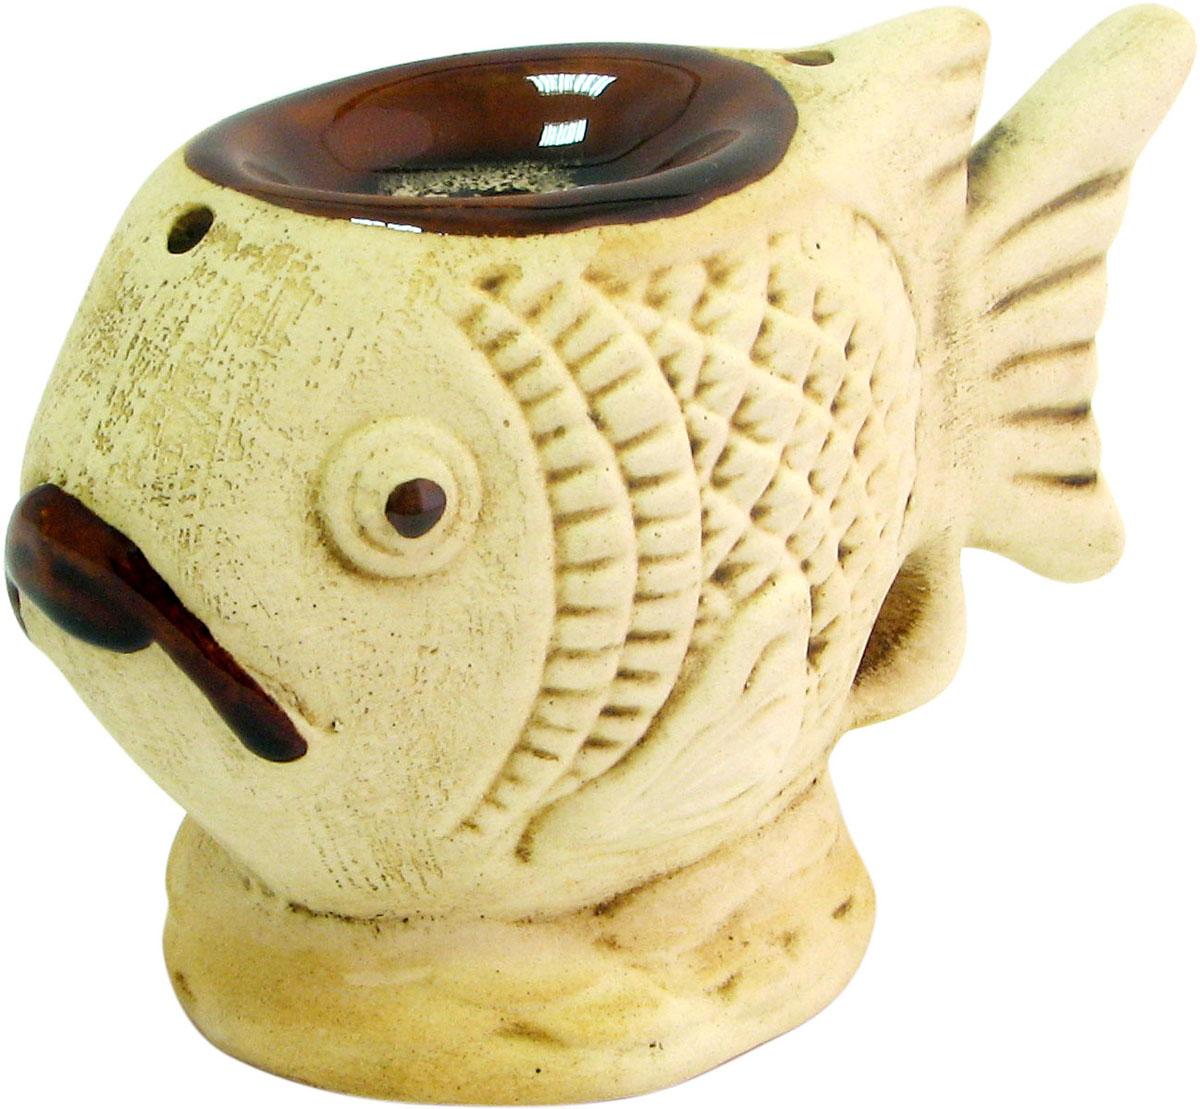 Аромалампа Рыба, цвет: коричневый, 10 см аромалампа шар